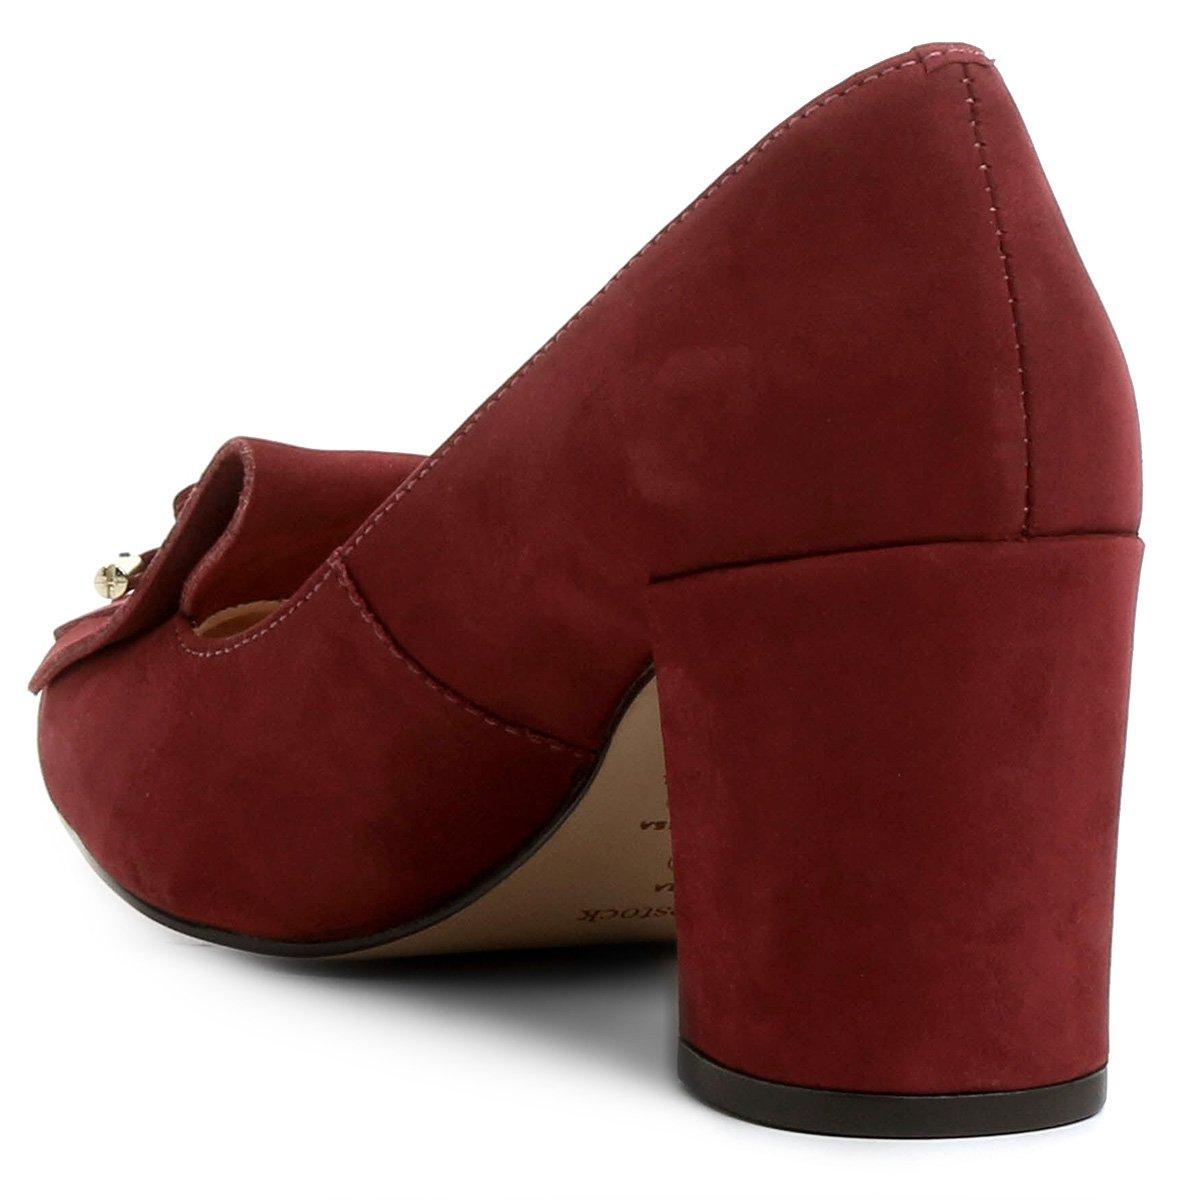 Médio Scarpin Vinho Scarpin Franjas Couro Couro Salto Shoestock qXrpxz8wX